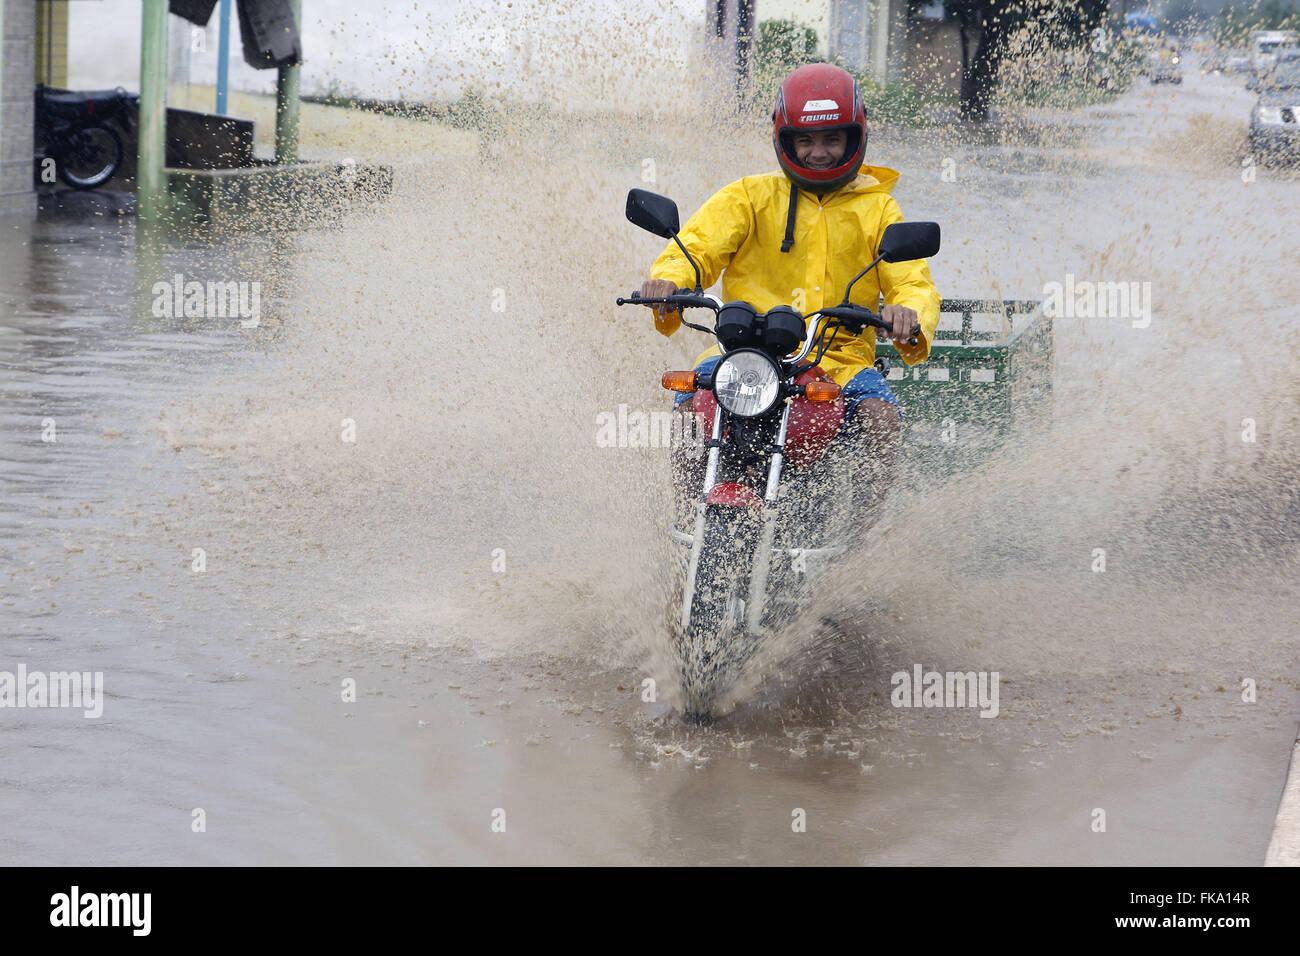 Biker traveling at street runoff during storm - Stock Image